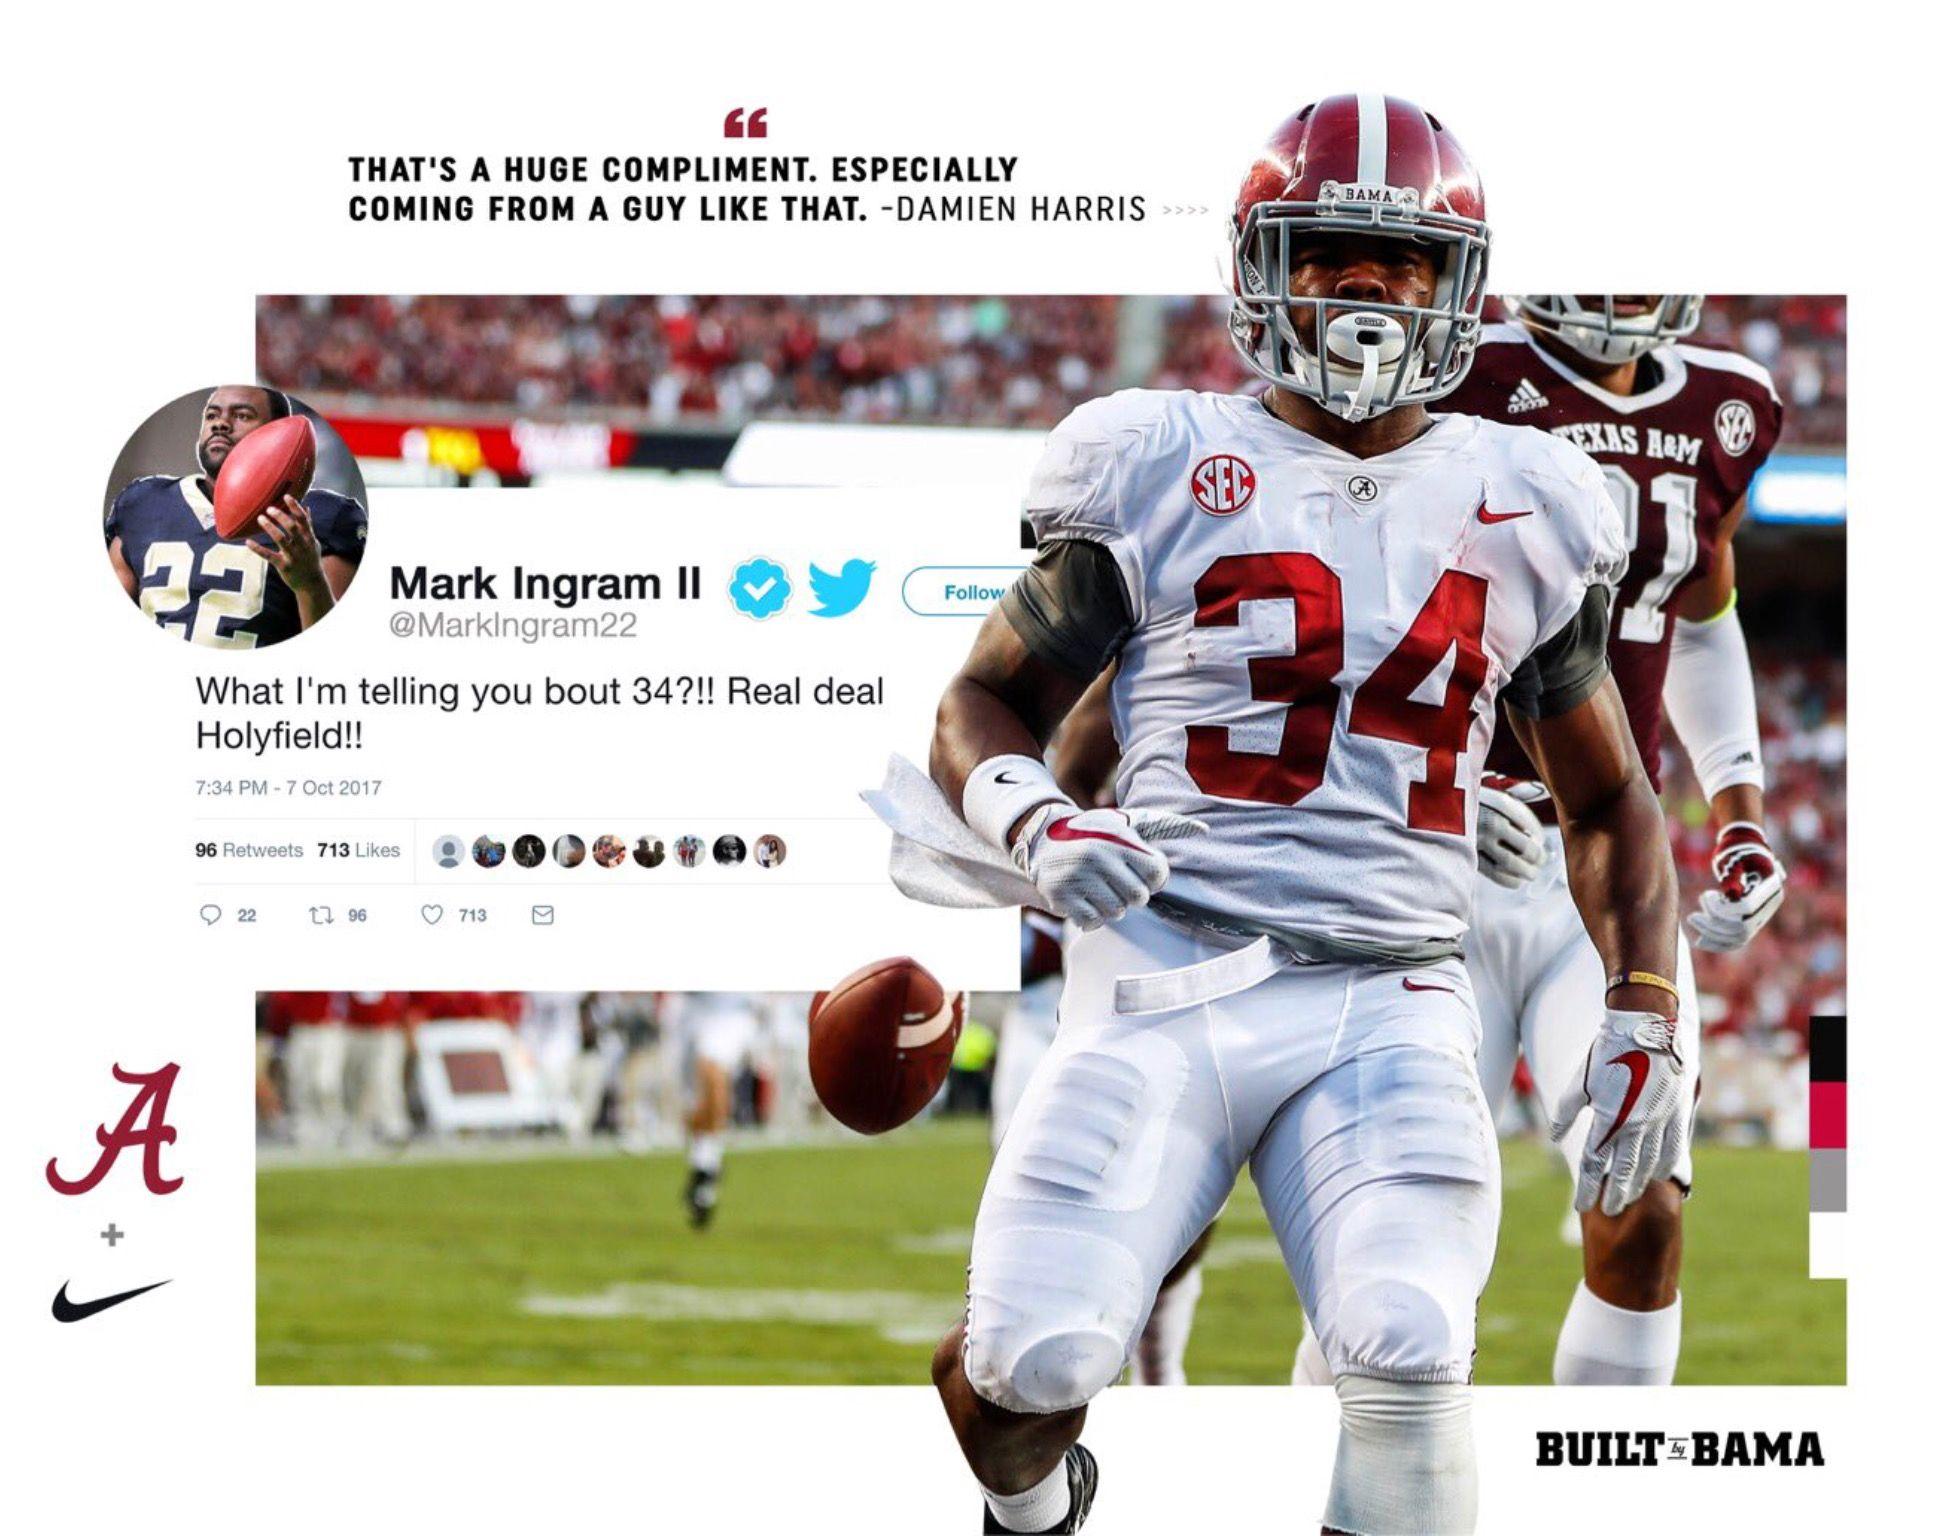 Running Wild Cover Of Tuscaloosa News College Football Preview 2017 Bo Scarbrough Damien Harris Joshua Ja Alabama Football Alabama Crimson Tide Tuscaloosa